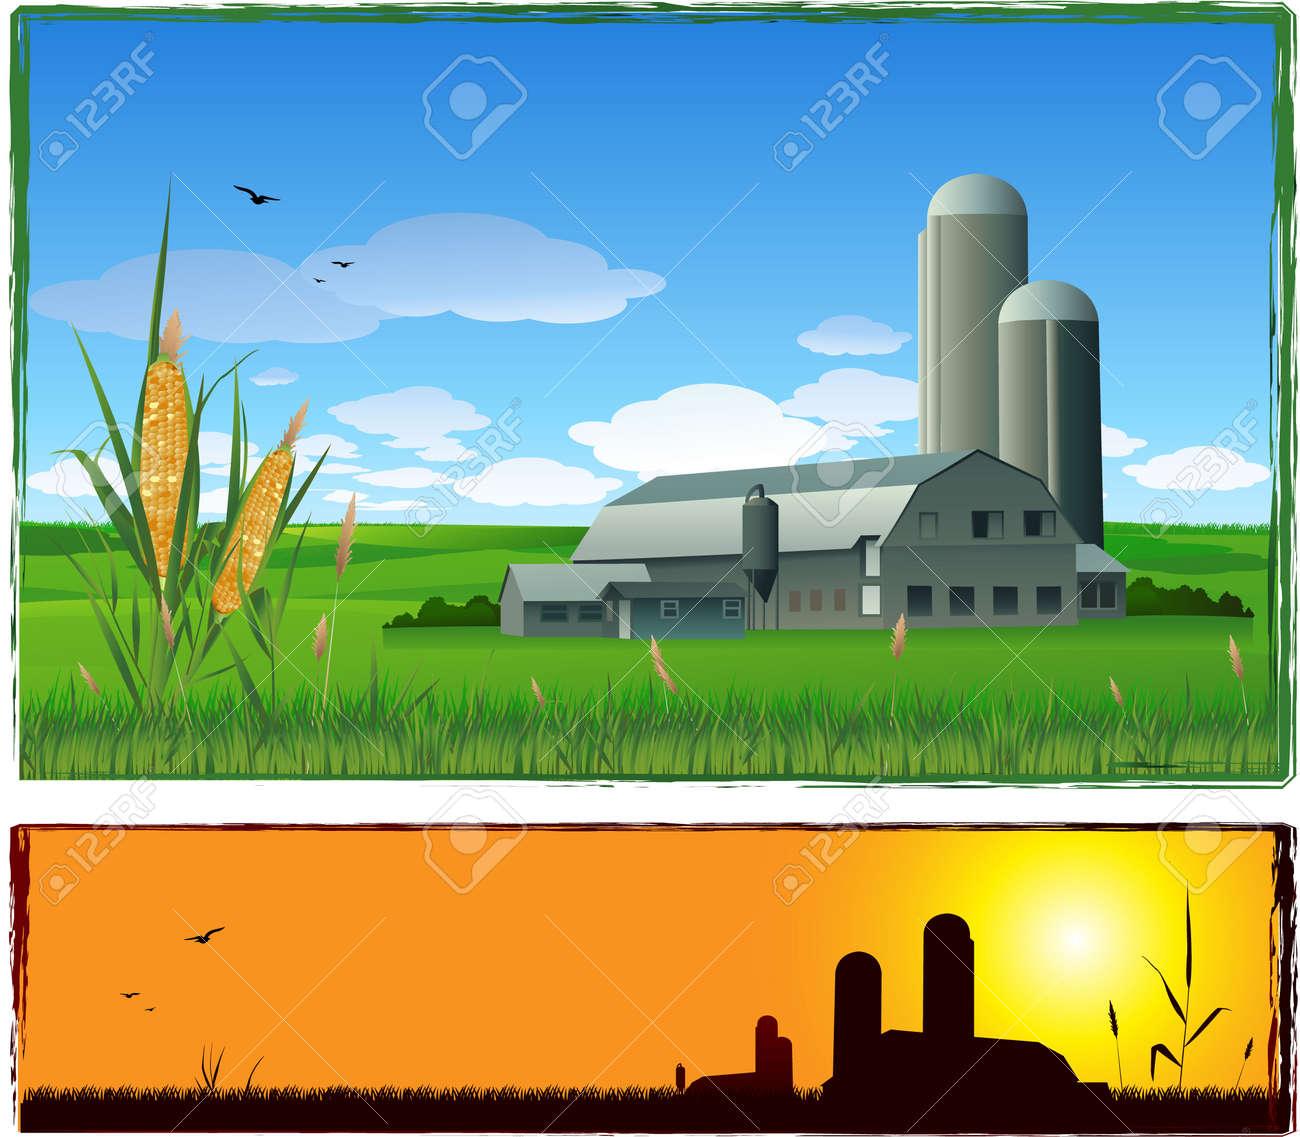 Farm illustration Stock Vector - 8630349